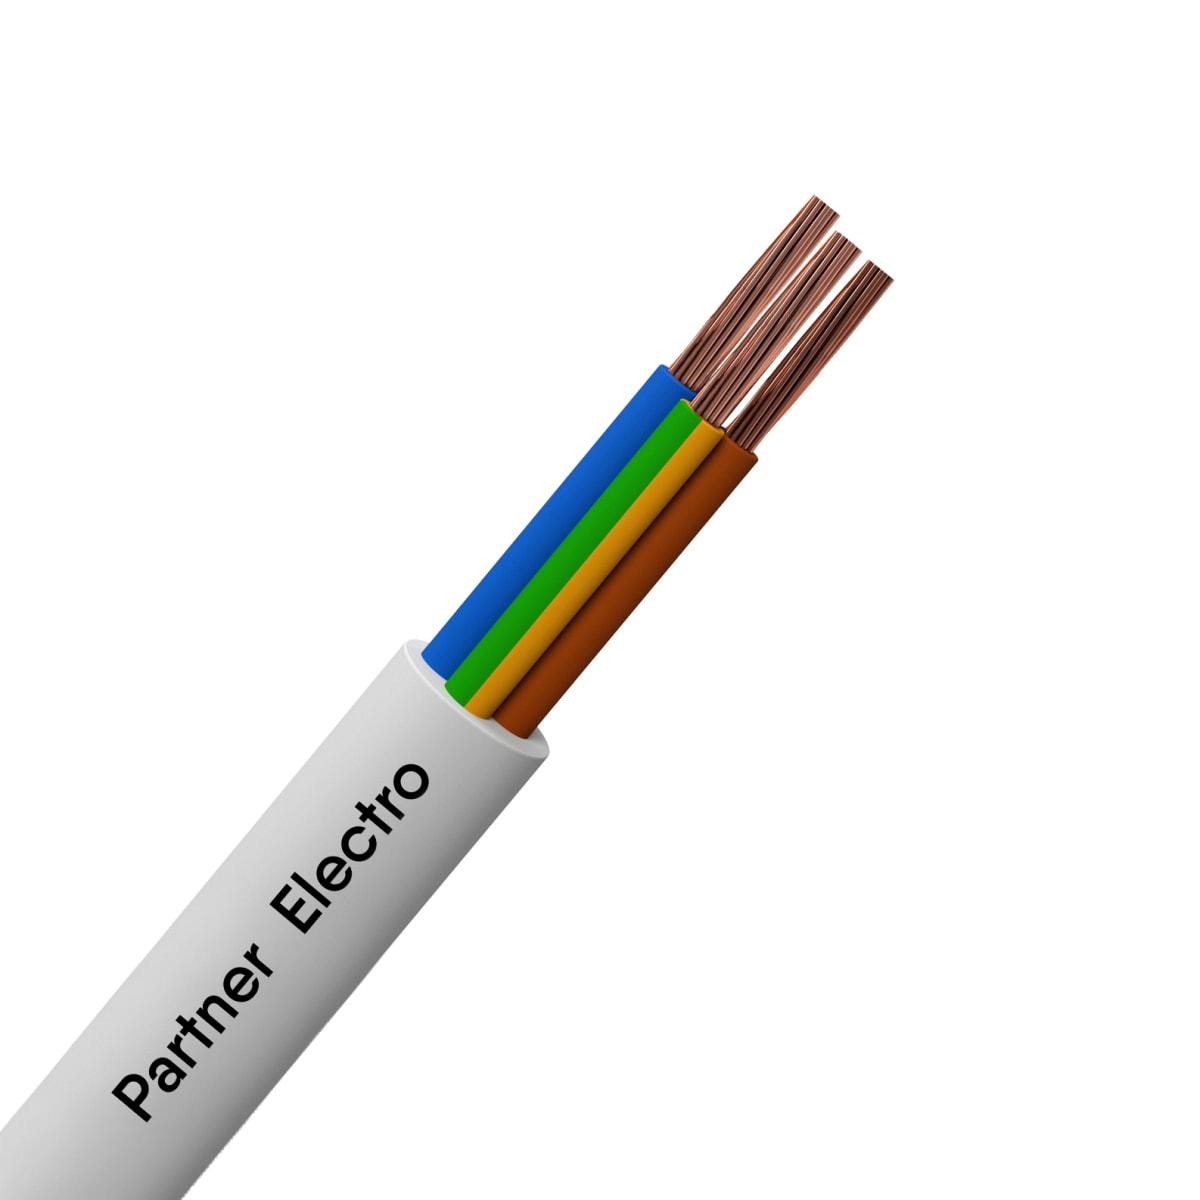 Провод Партнер-Электро ПВС 3x1.5, на отрез, ГОСТ